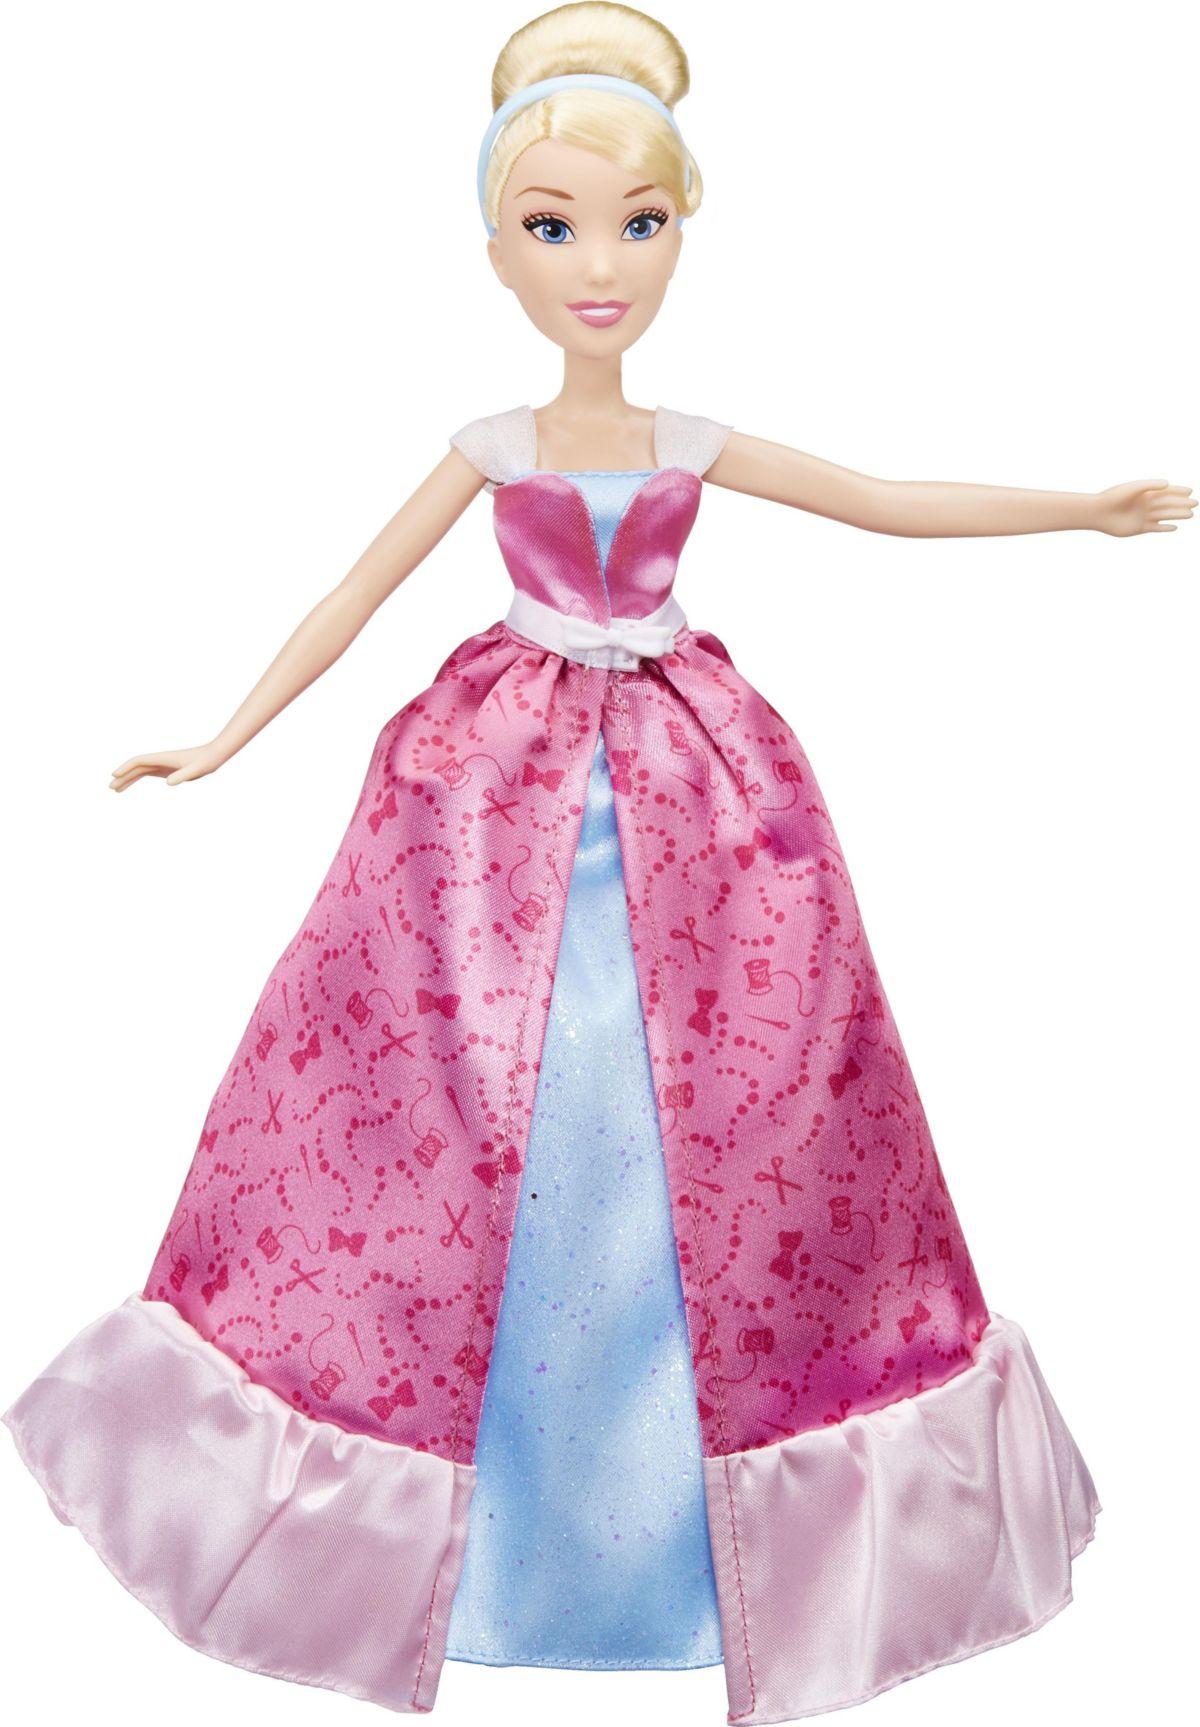 Hasbro Prinzessin Puppe, »Disney Princess Verwandle dich Cinderella«